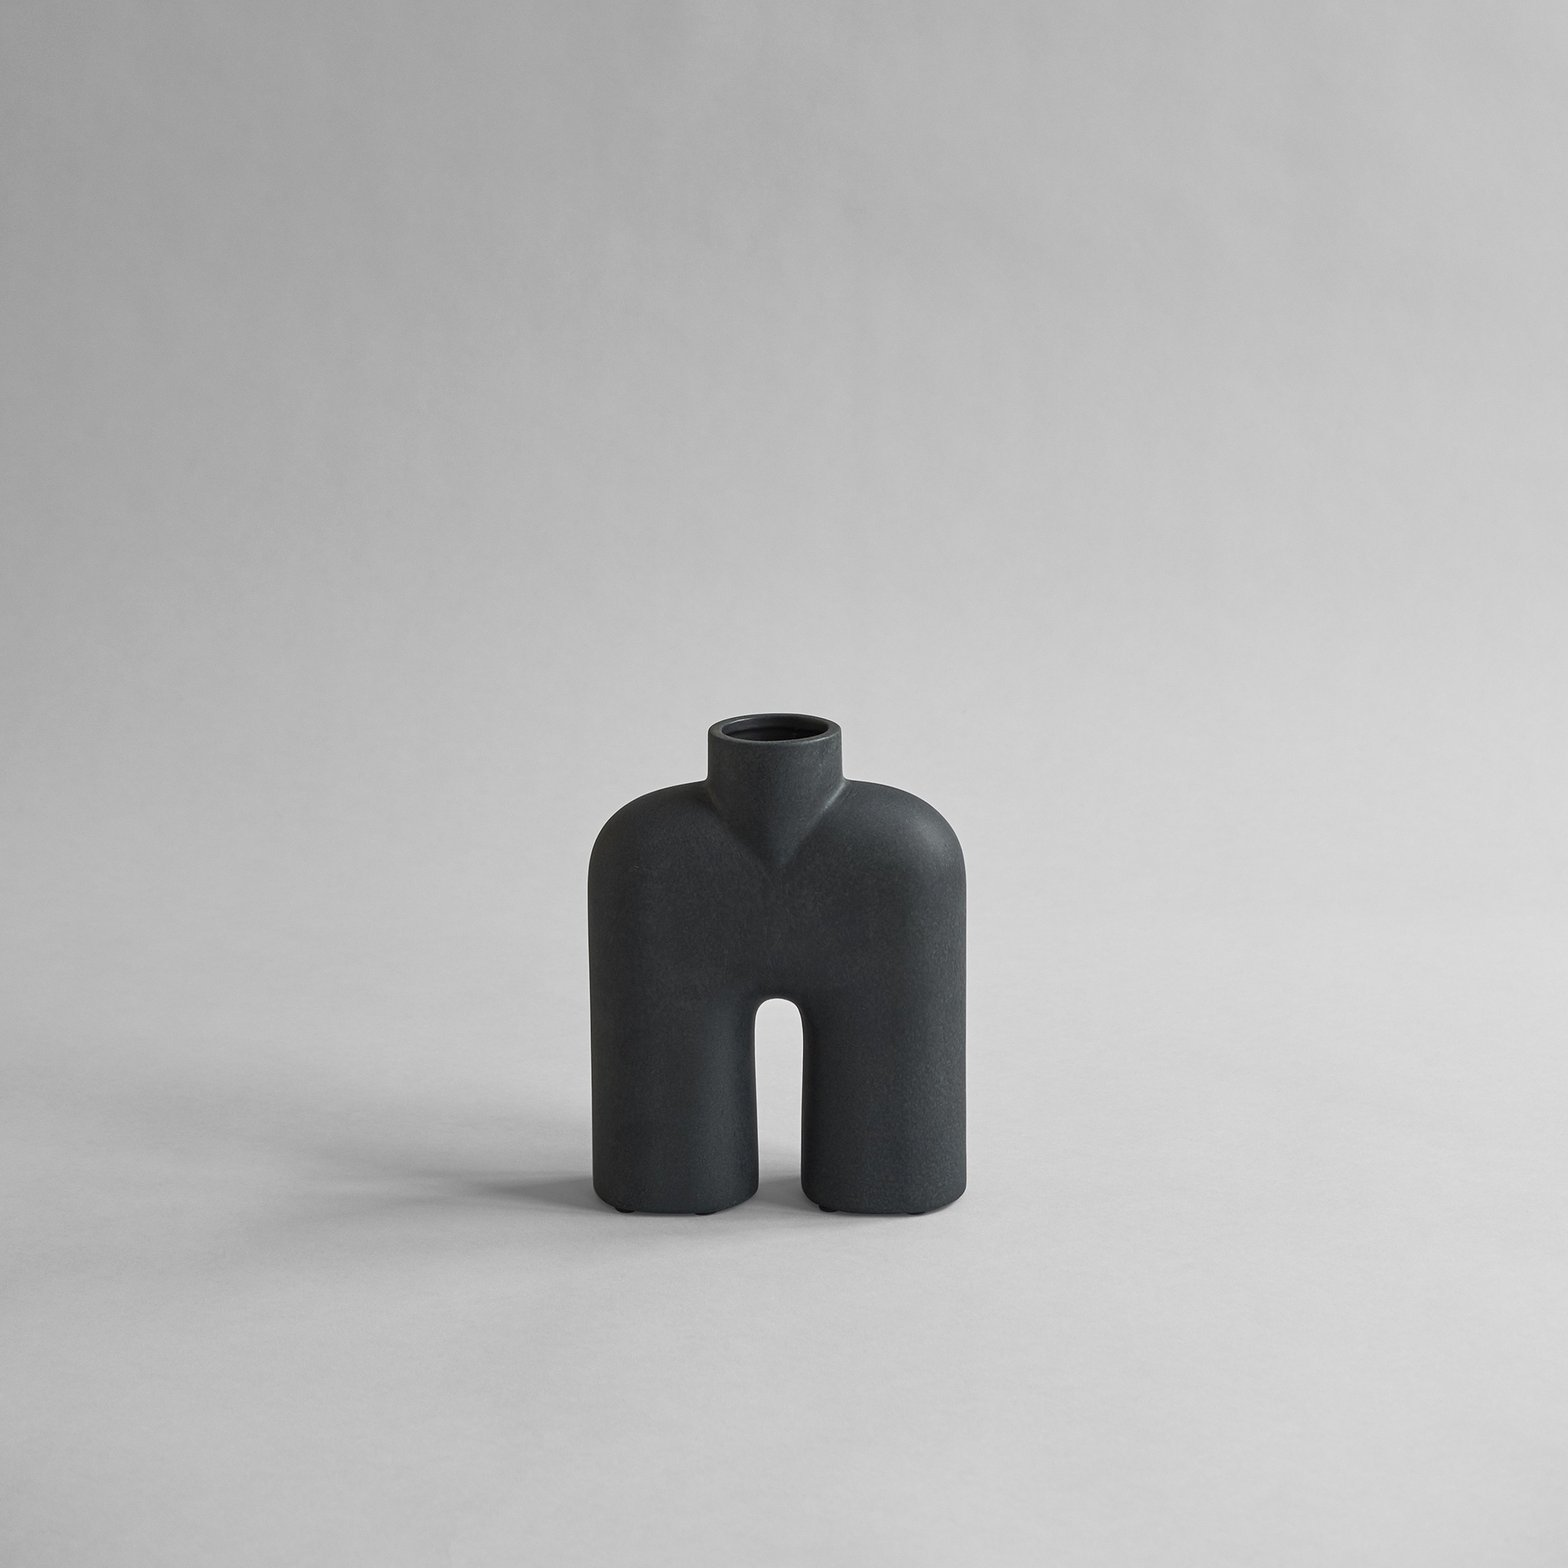 Object Cobra tall black | Design Studio Anneke Crauwels | Interieur | Mechelen